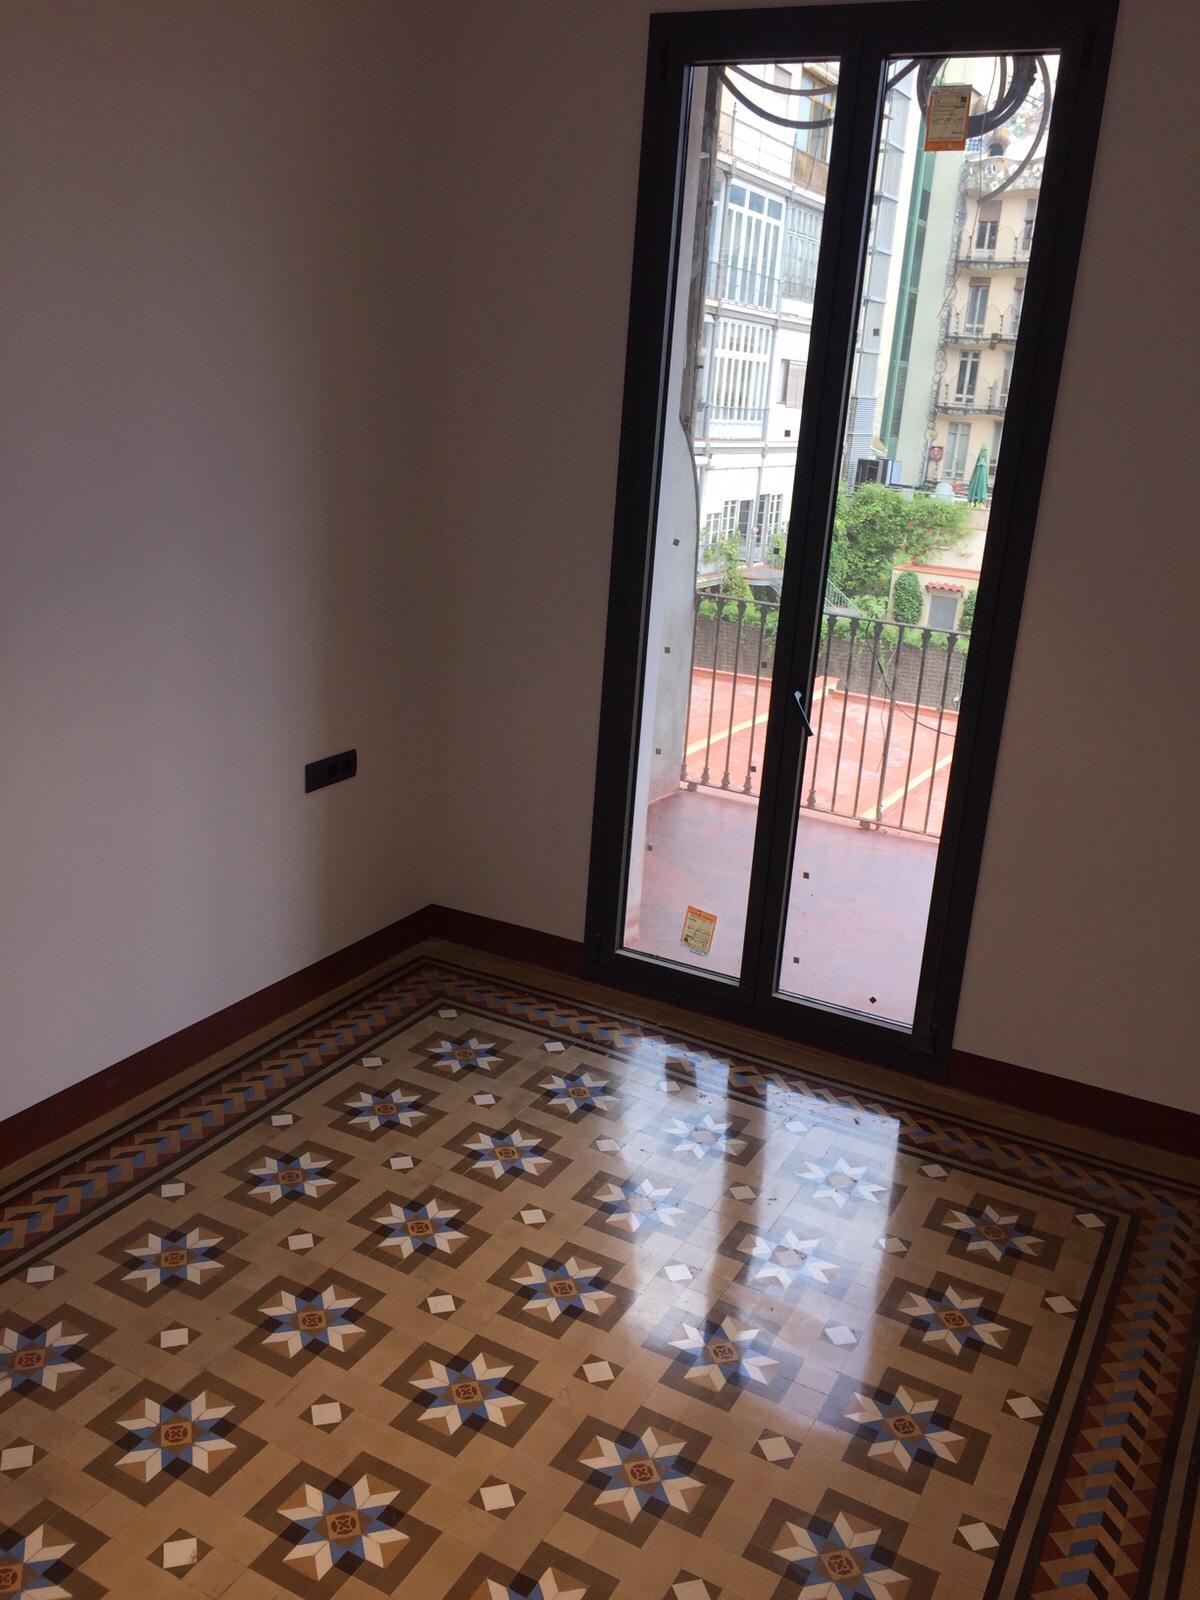 Rehabilitacion-de-suelo-de-mosaico-nolla-Barcelona